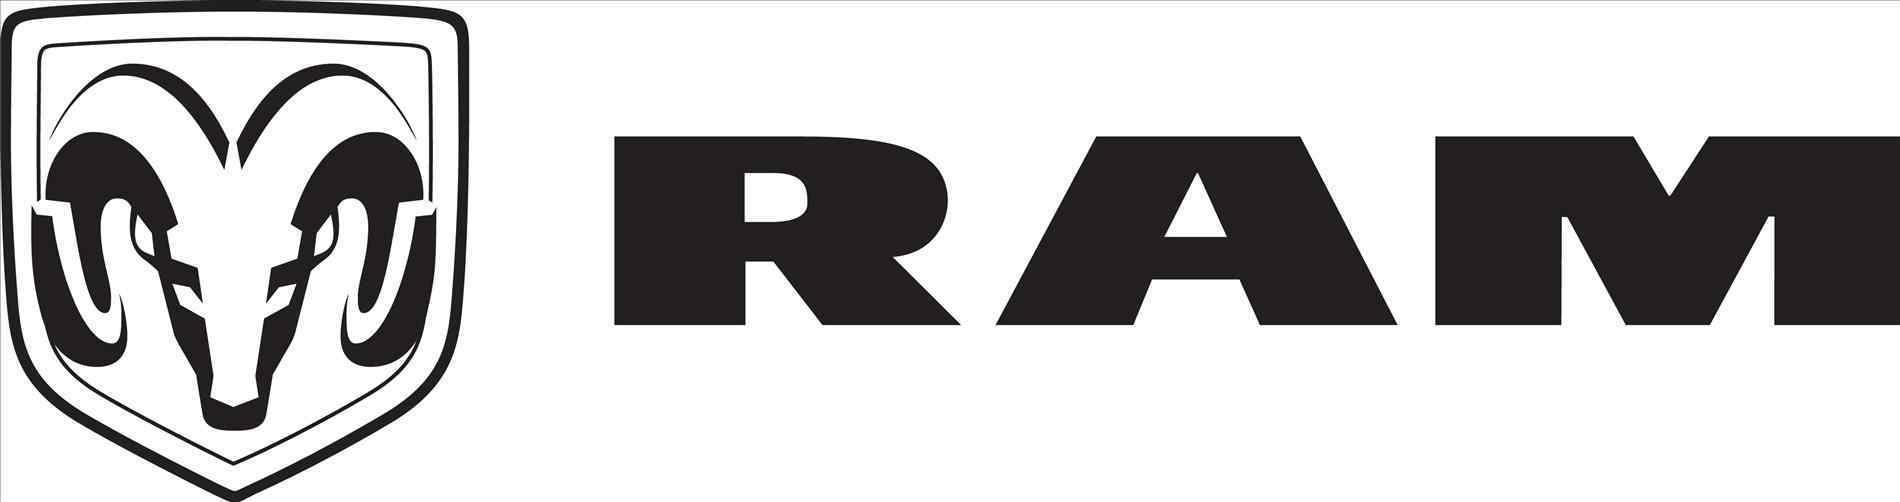 1900x502 Png Cartyperhcartypecom Dodge Ram Logo Vector Amazing Newsday With